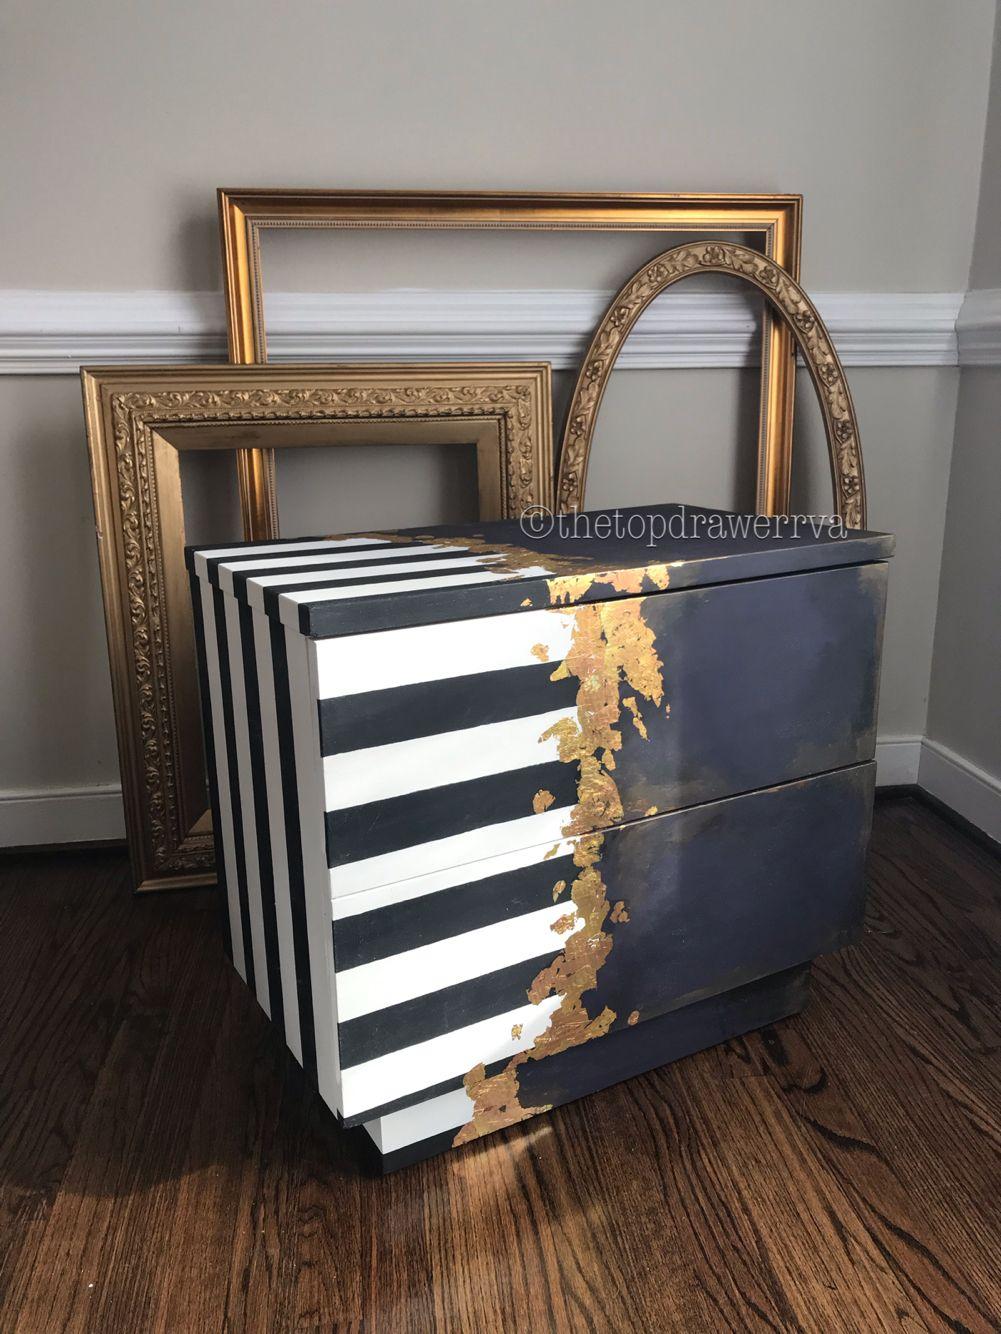 Gold Leaf Metallic Leaf Funky Furniture Black And White Stripes